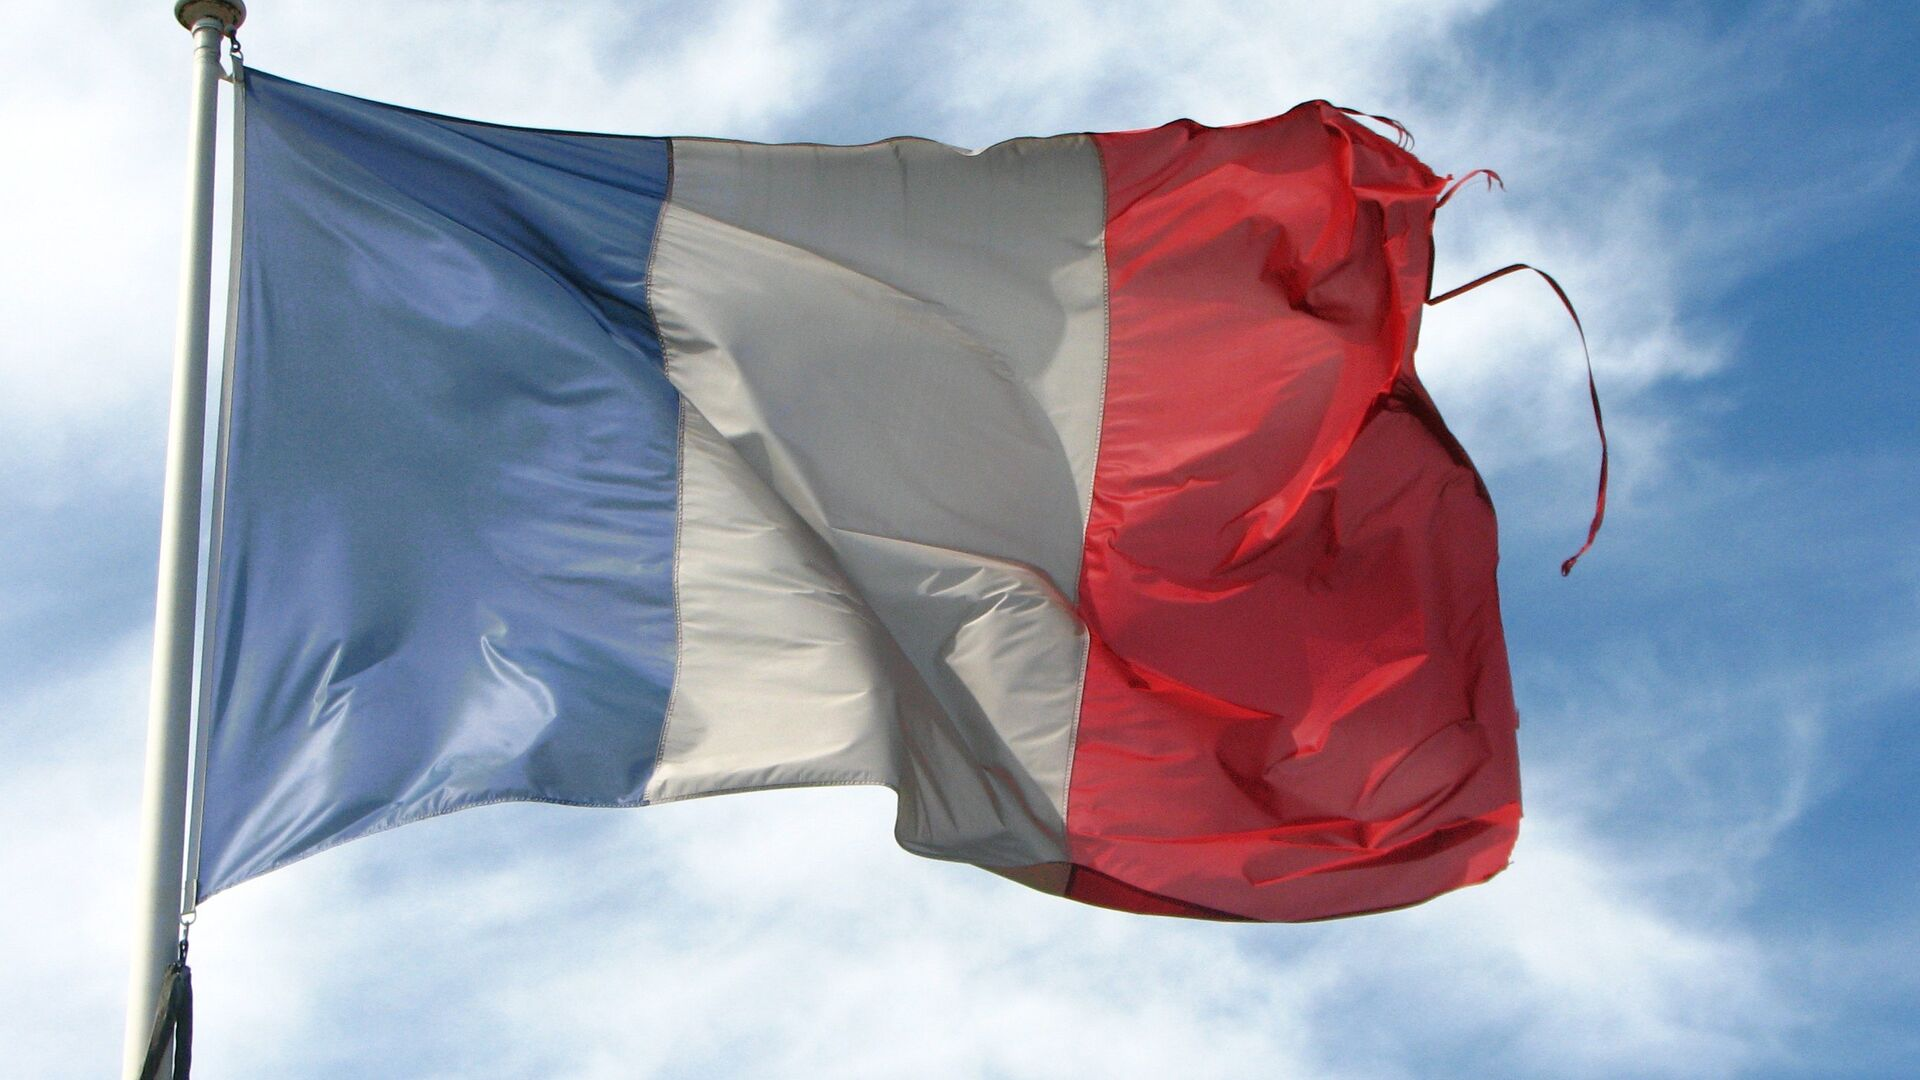 La bandera de Francia - Sputnik Mundo, 1920, 28.04.2021